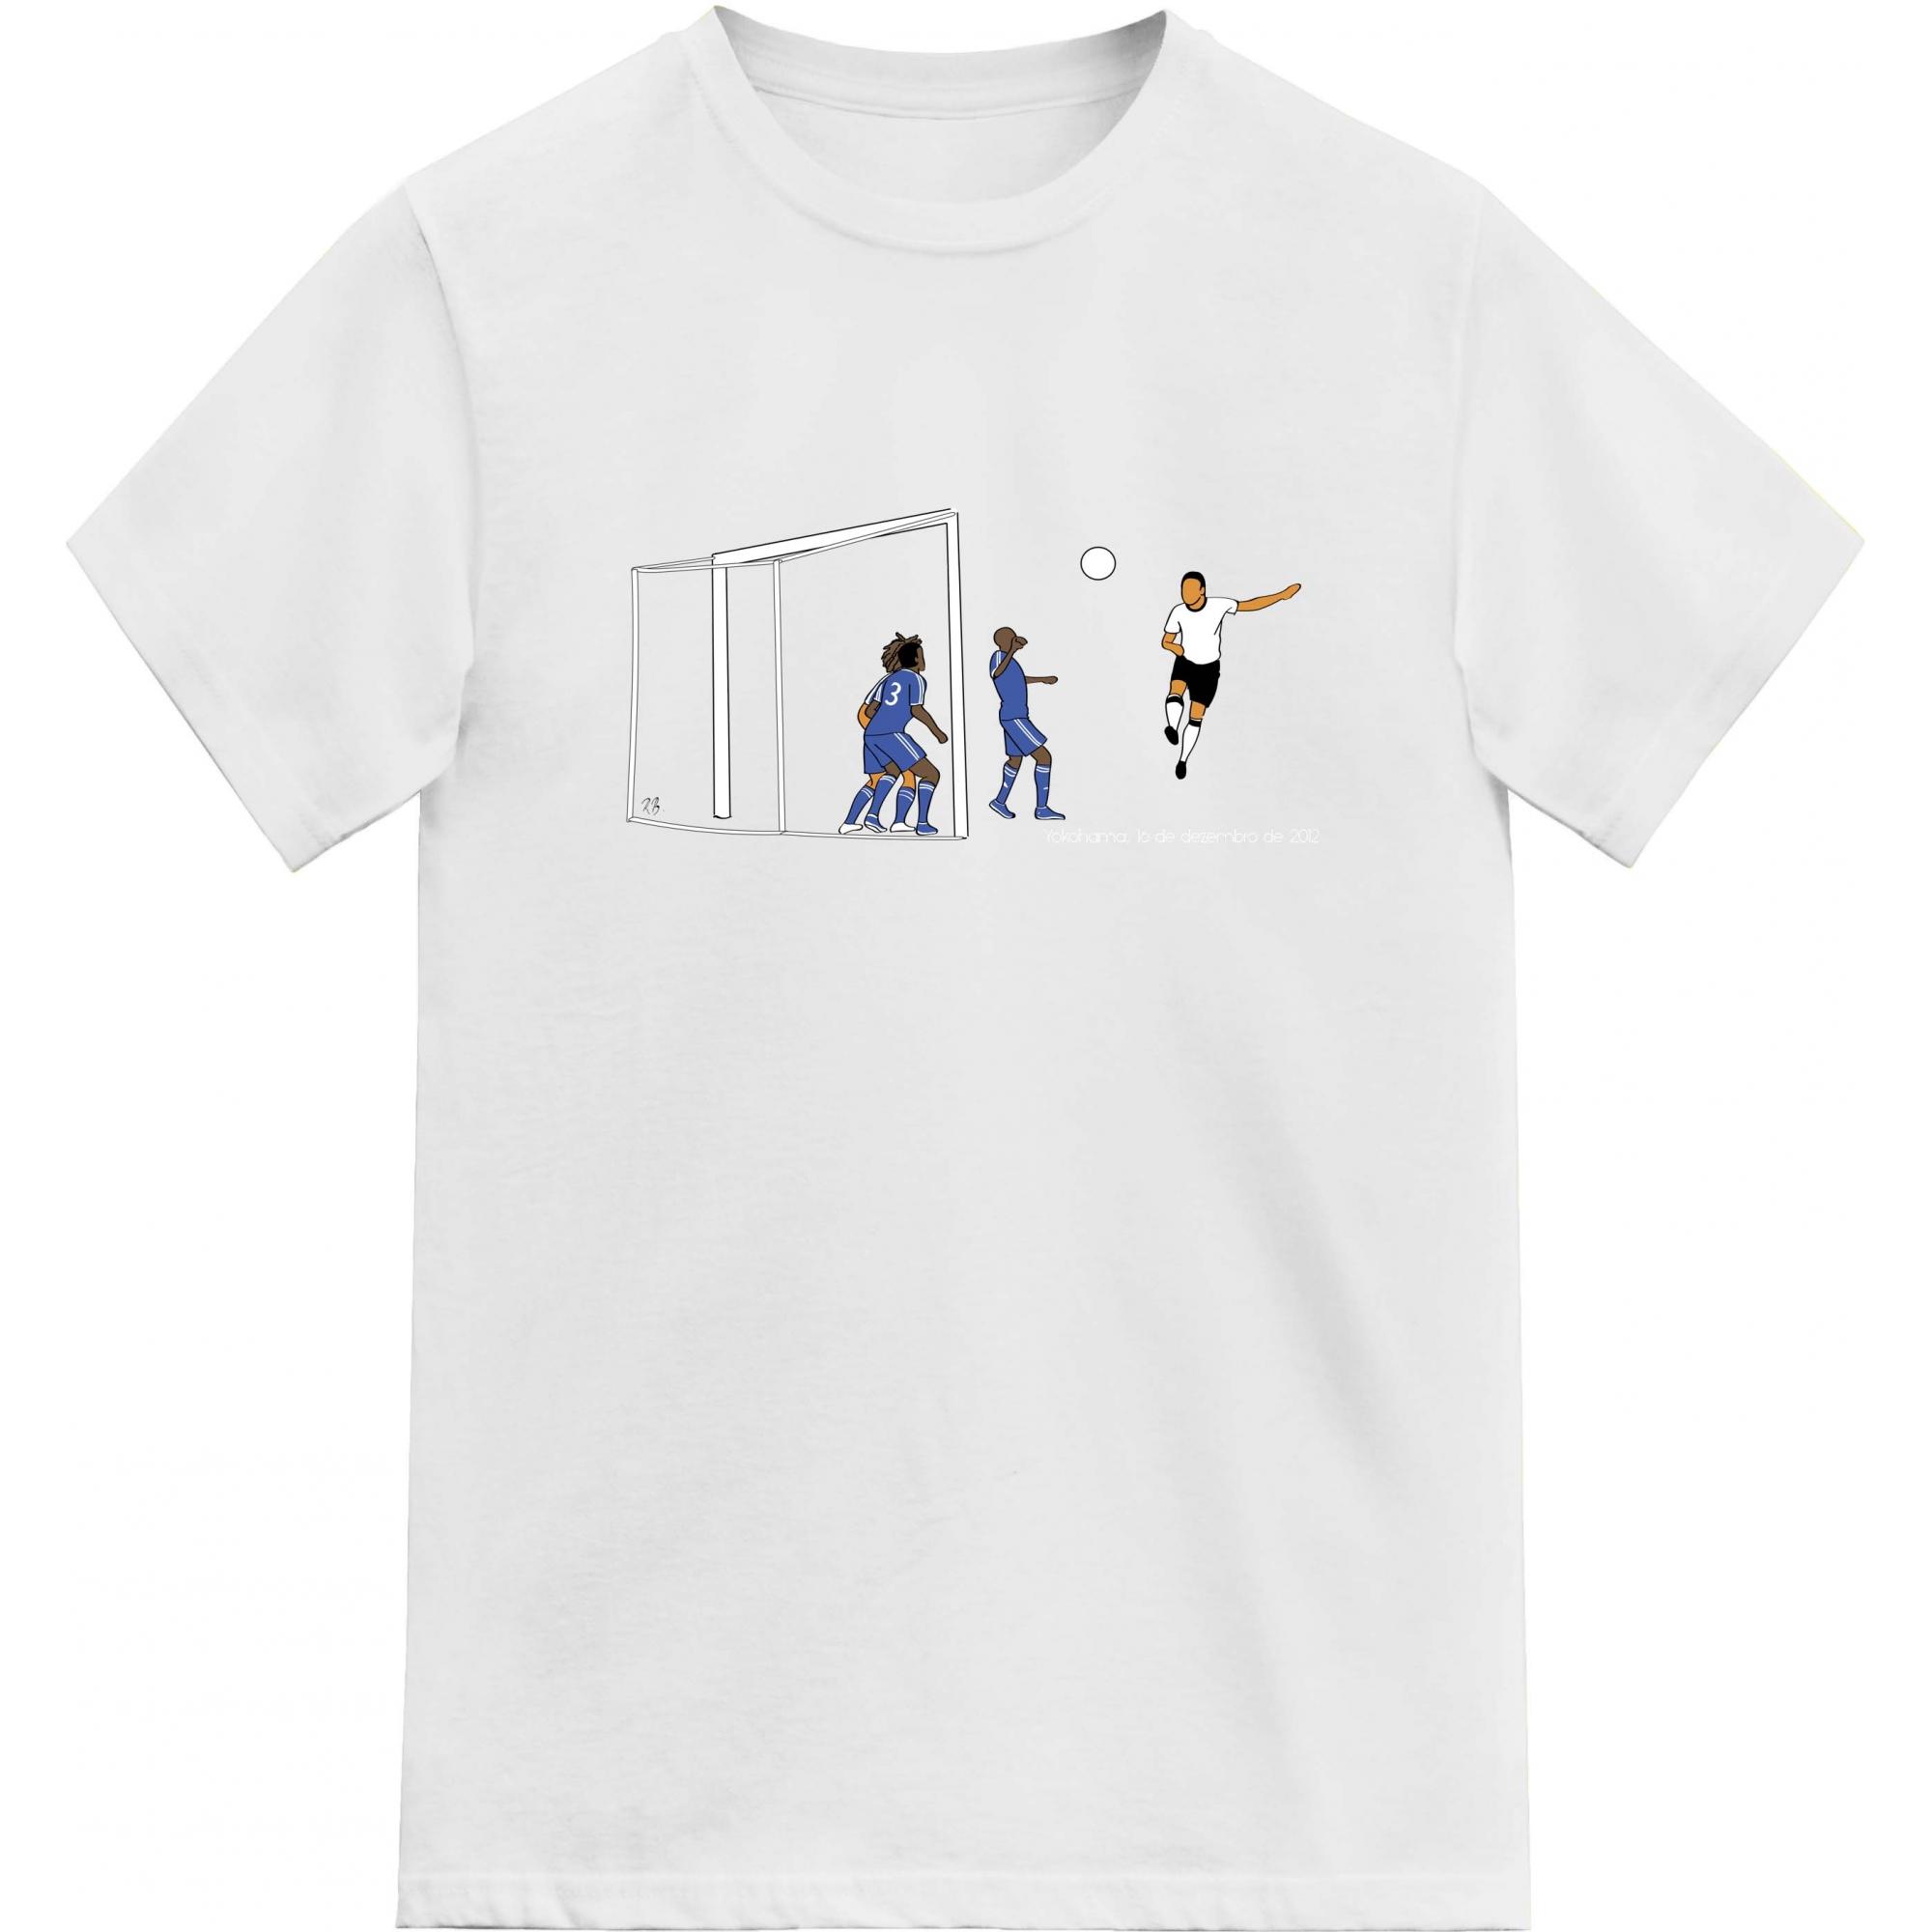 Camiseta - Mundo Preto e Branco OUTLET